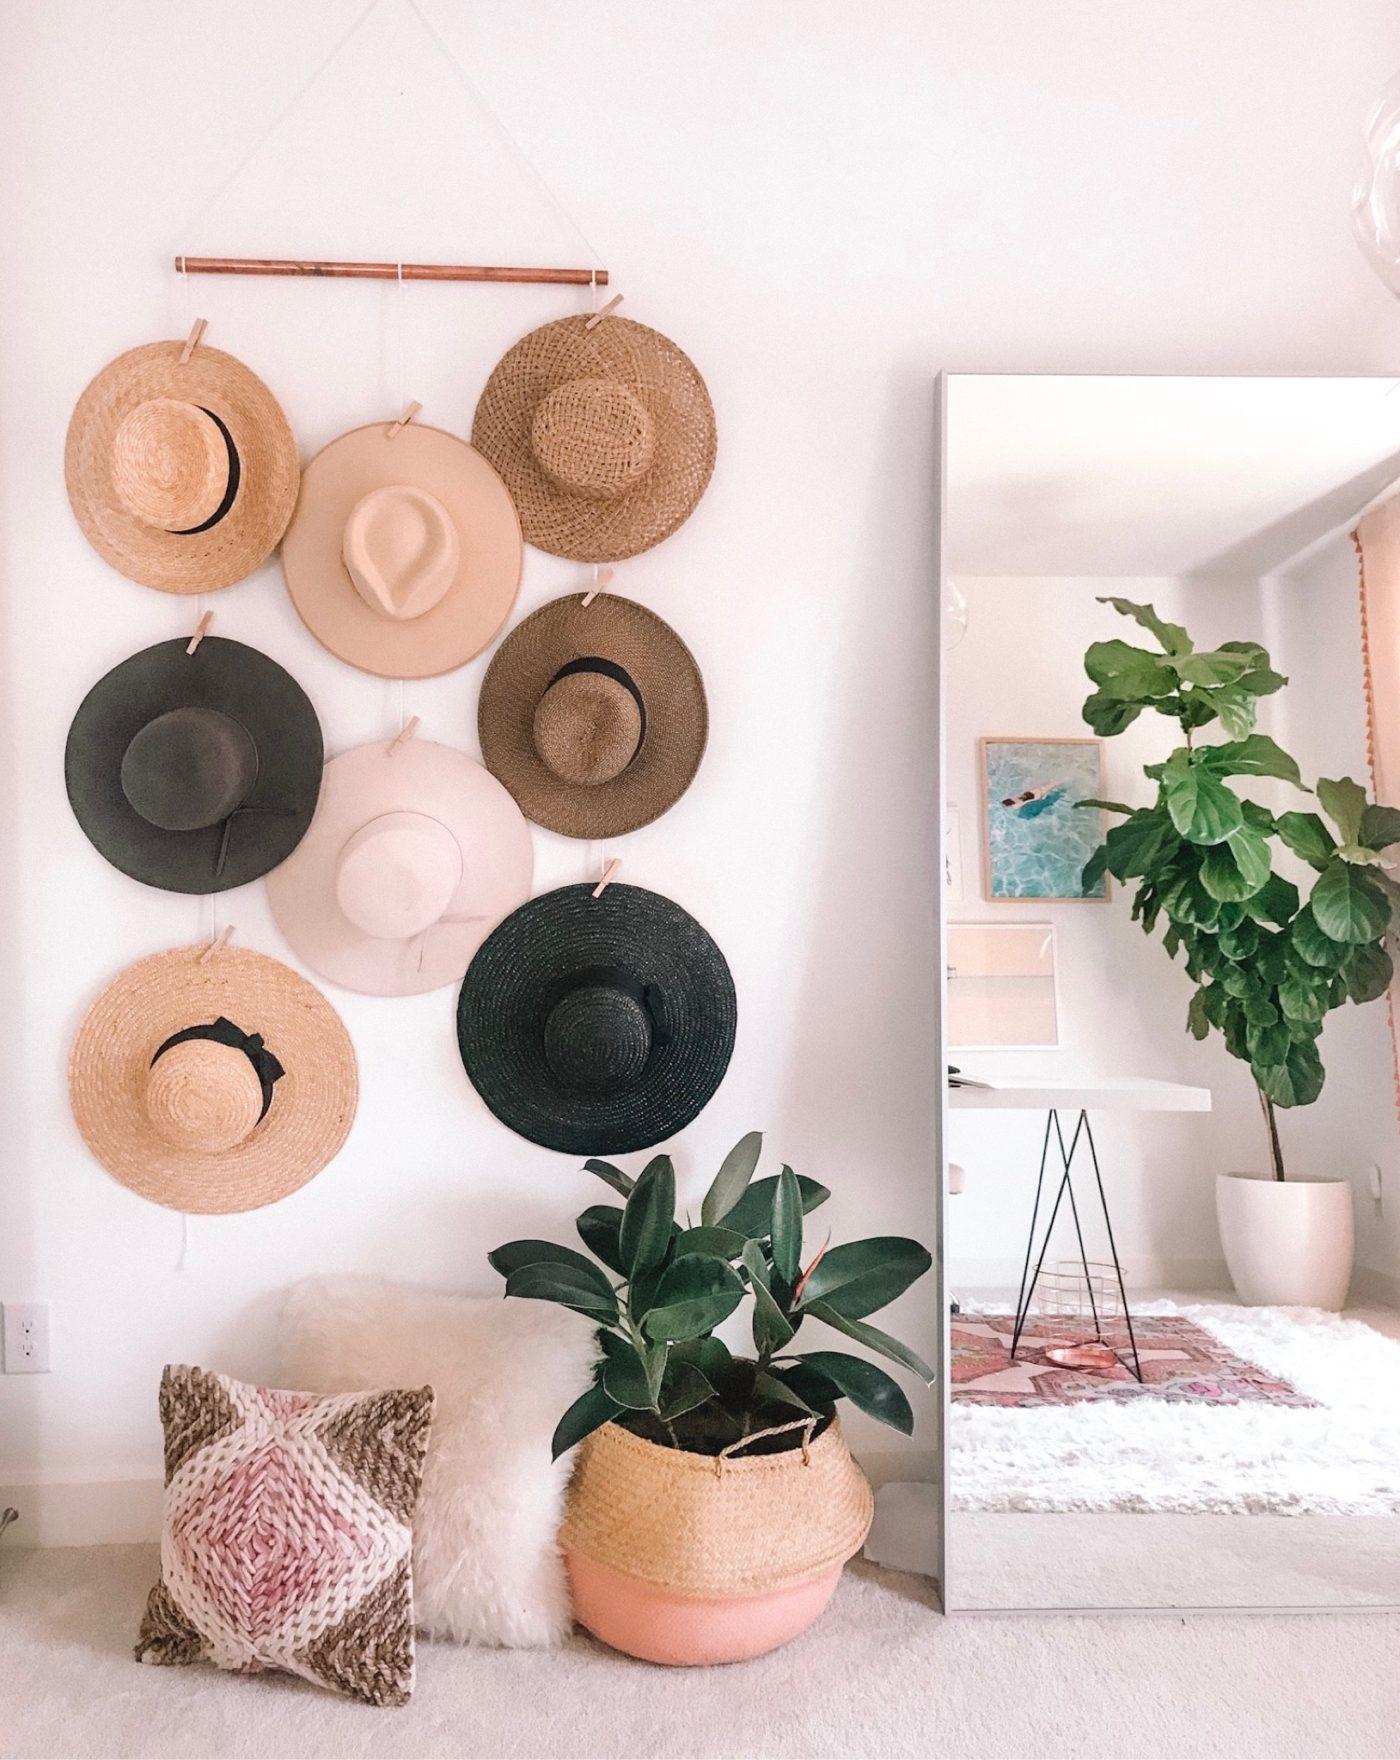 organize hats on this diy hat rack